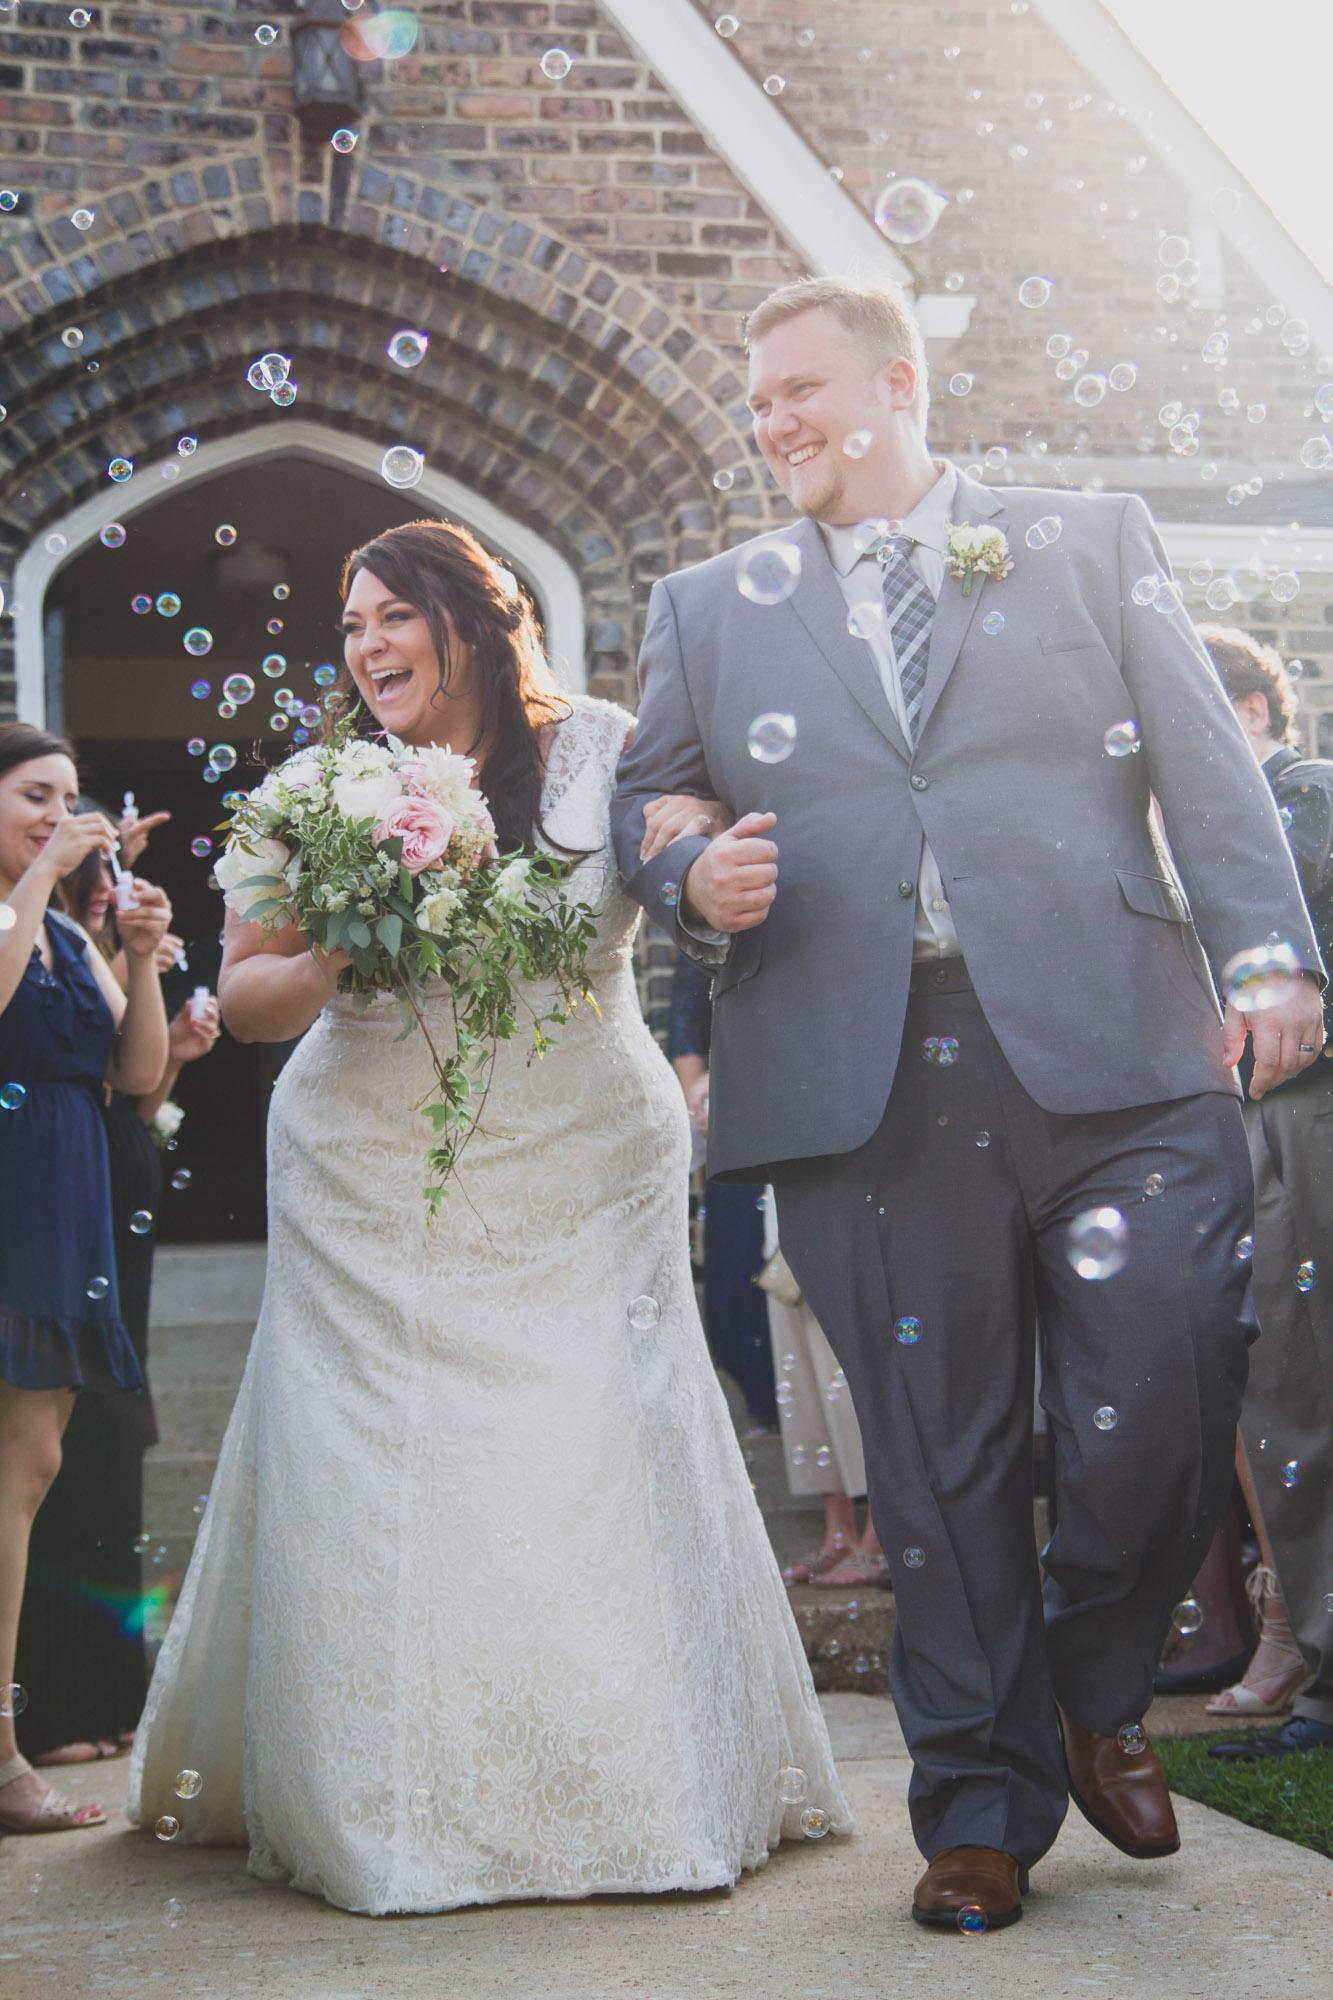 wedding day bubbles